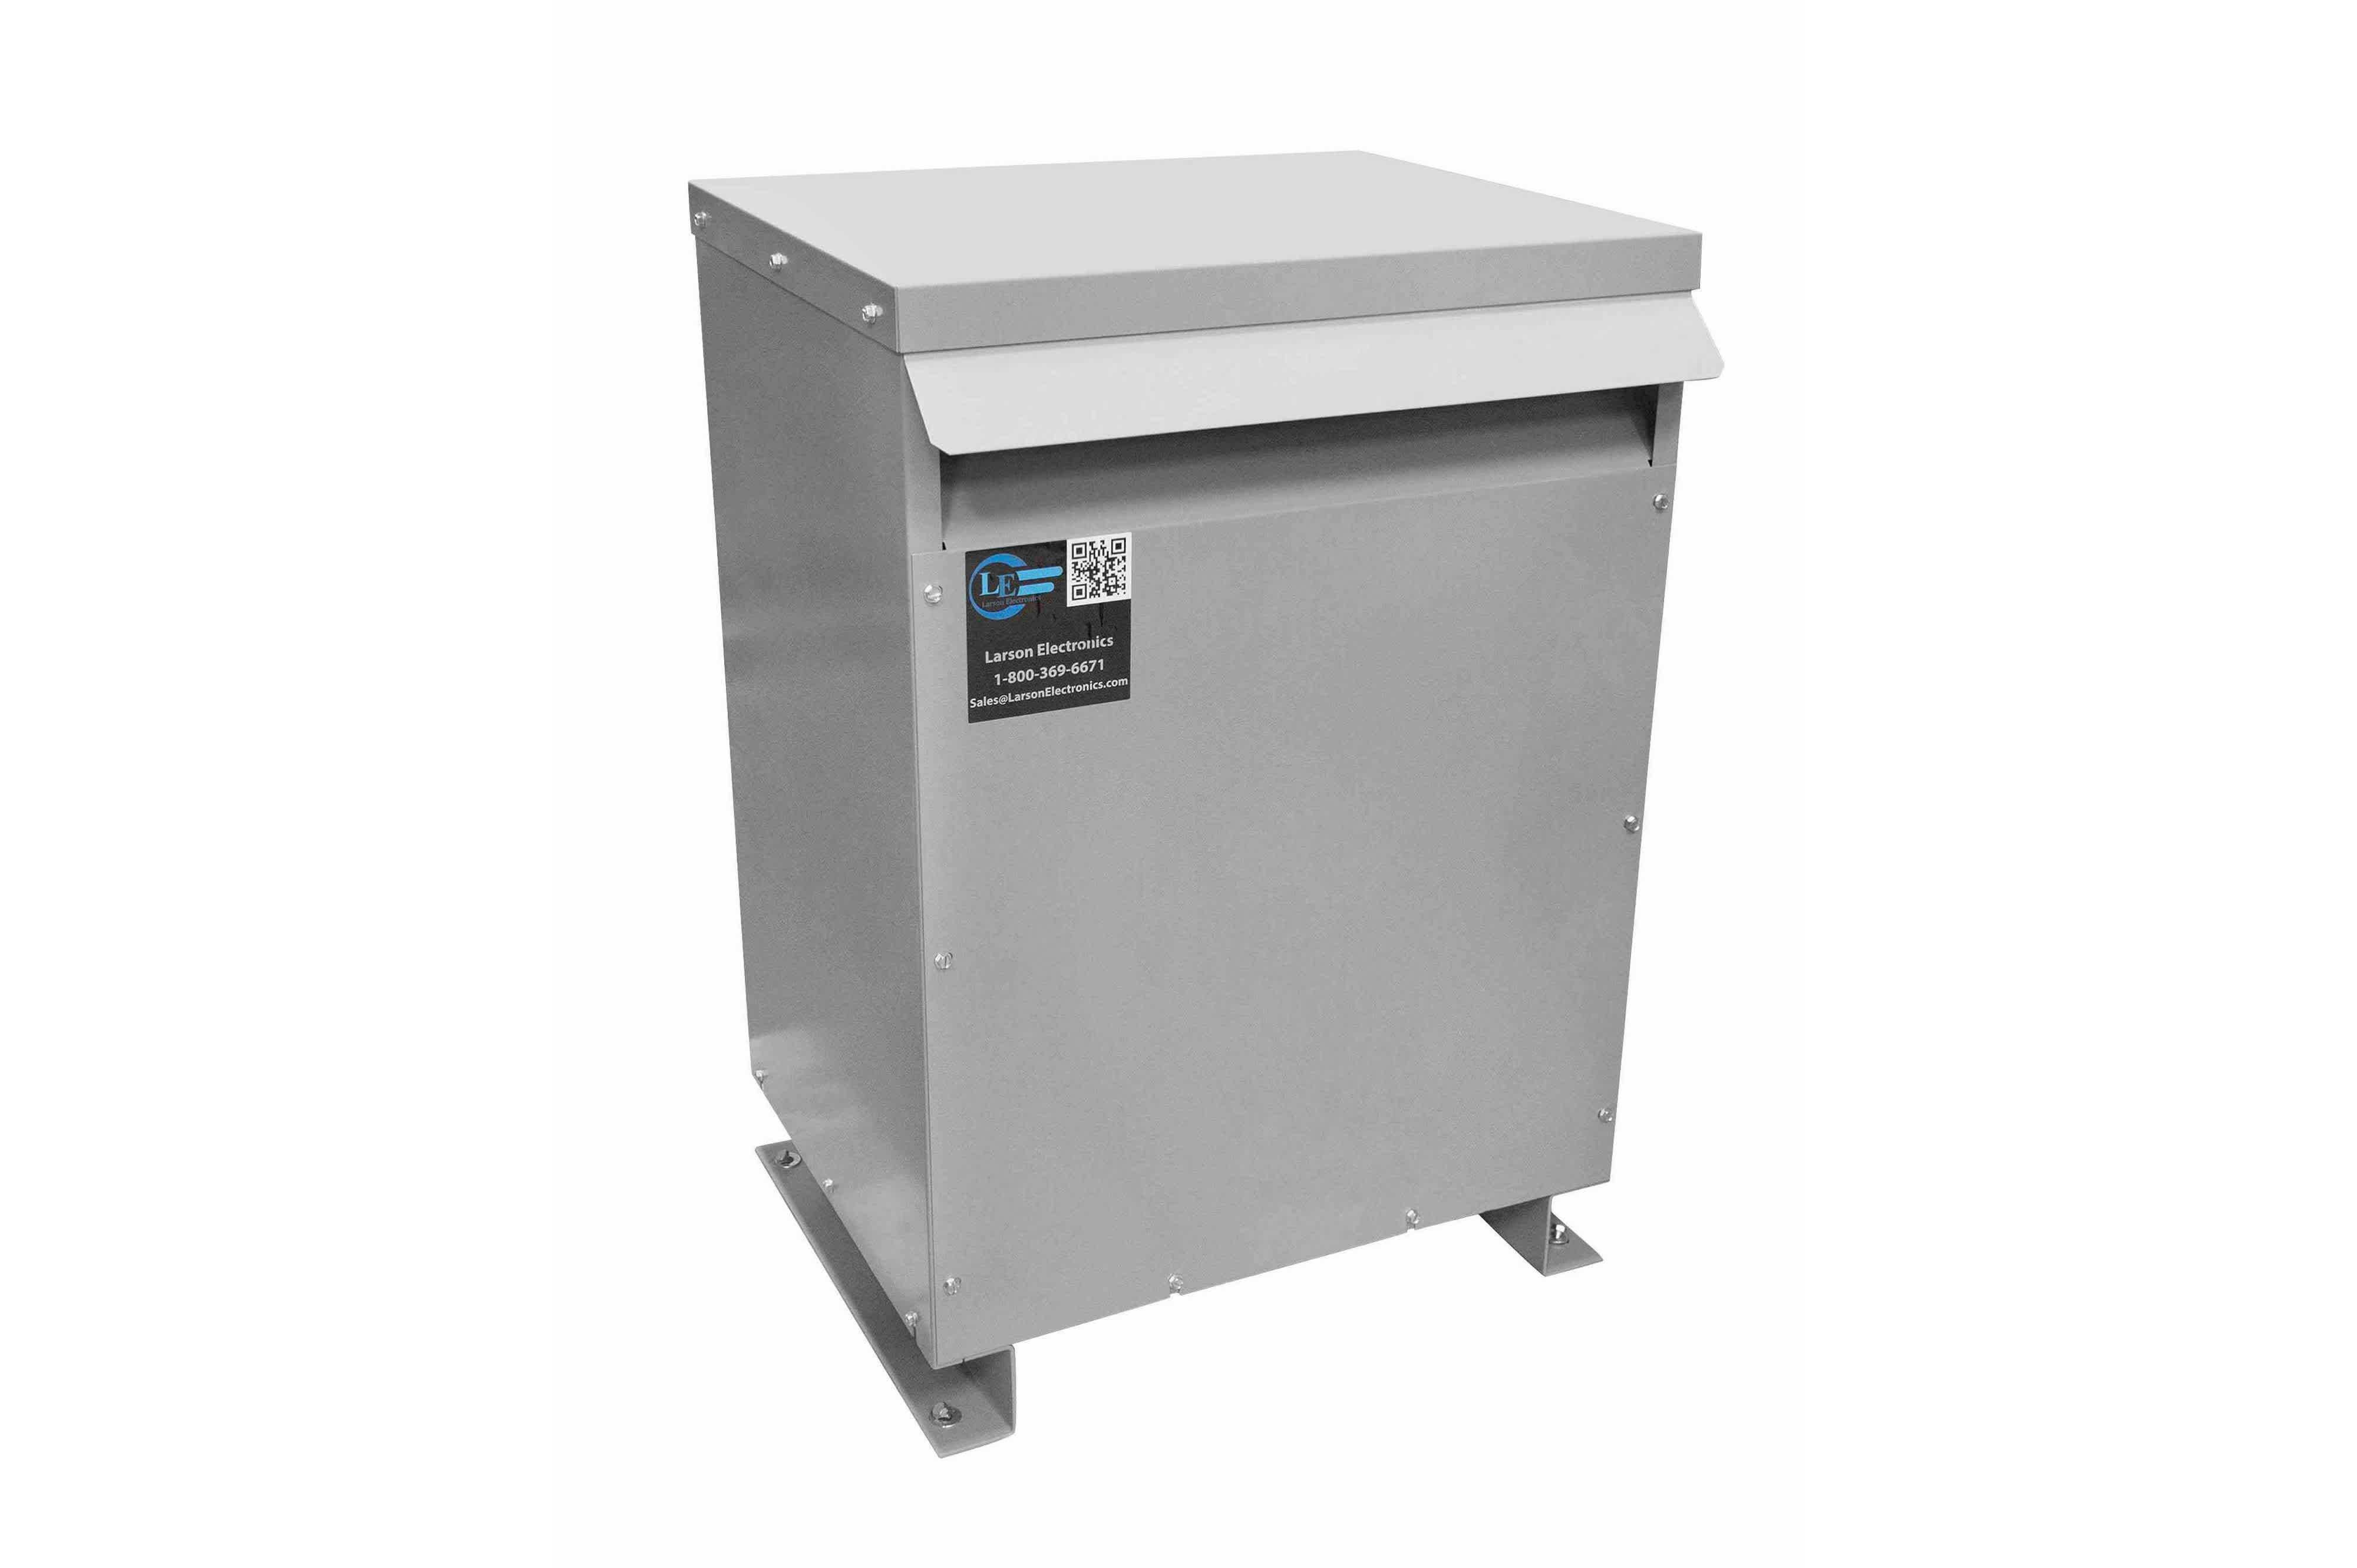 13 kVA 3PH Isolation Transformer, 480V Wye Primary, 400V Delta Secondary, N3R, Ventilated, 60 Hz